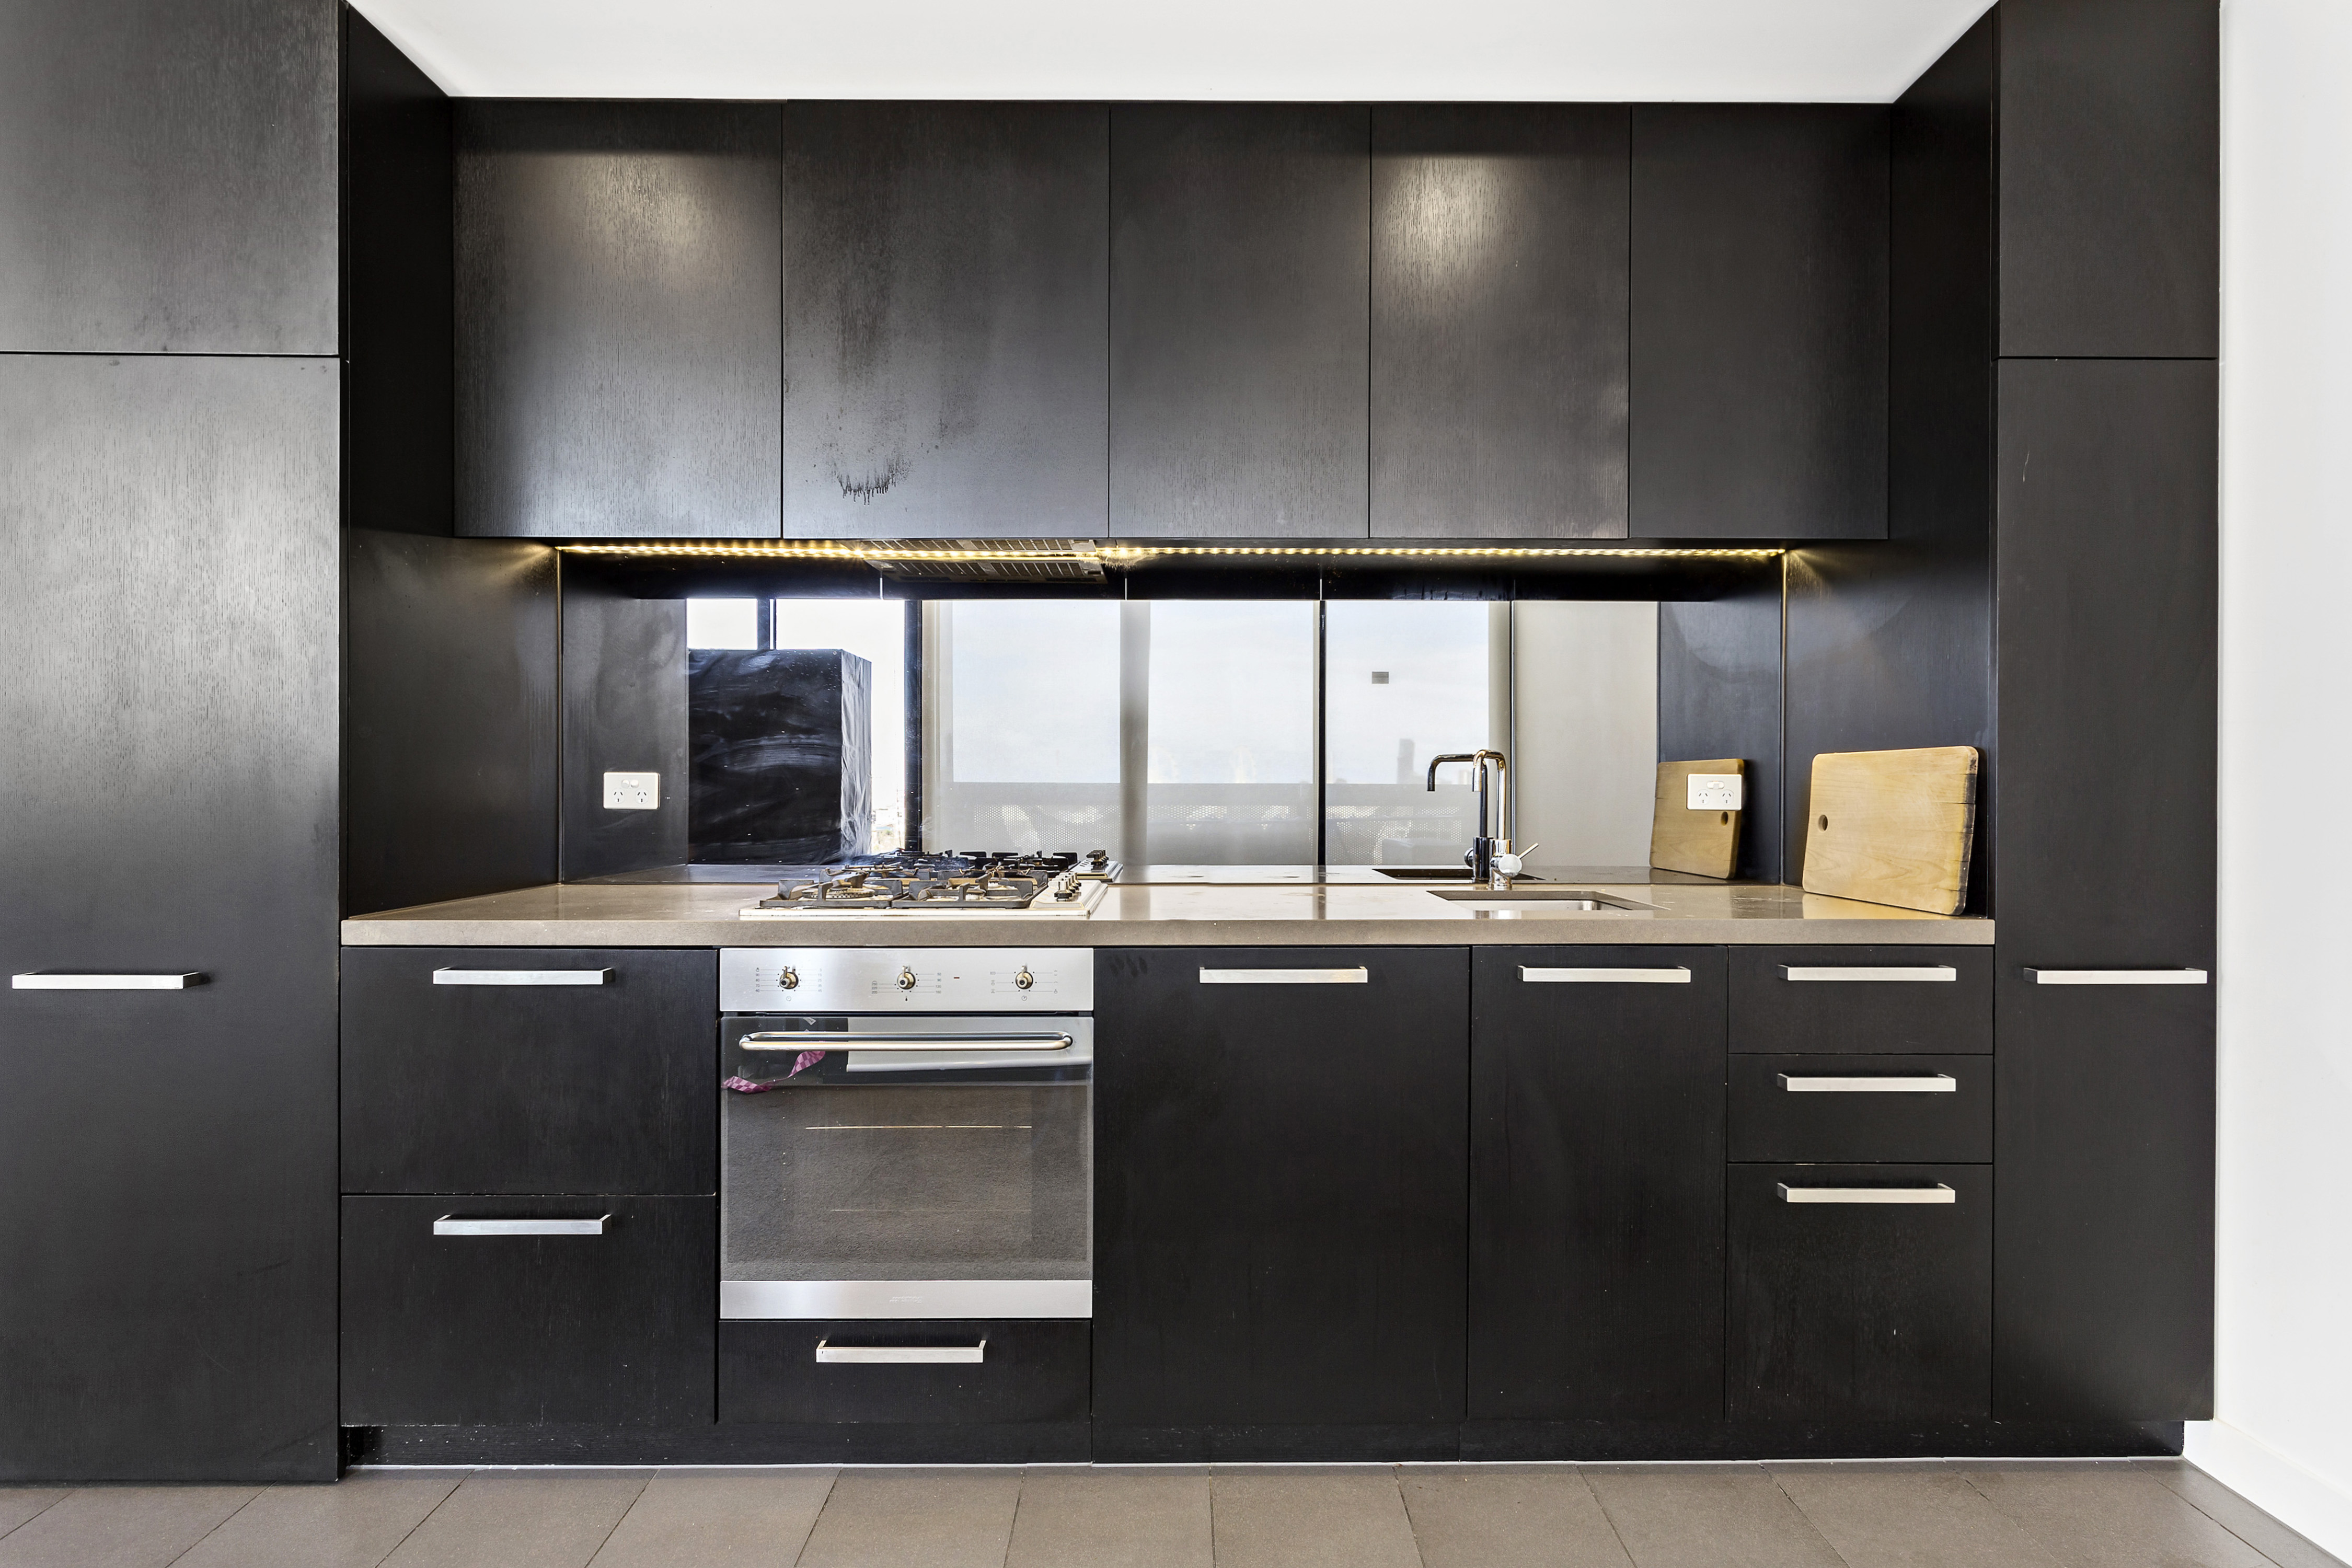 108-97-flemington-road-north-melbourne-student-accommodation-Melbourne-Kitchen-Unilodgers